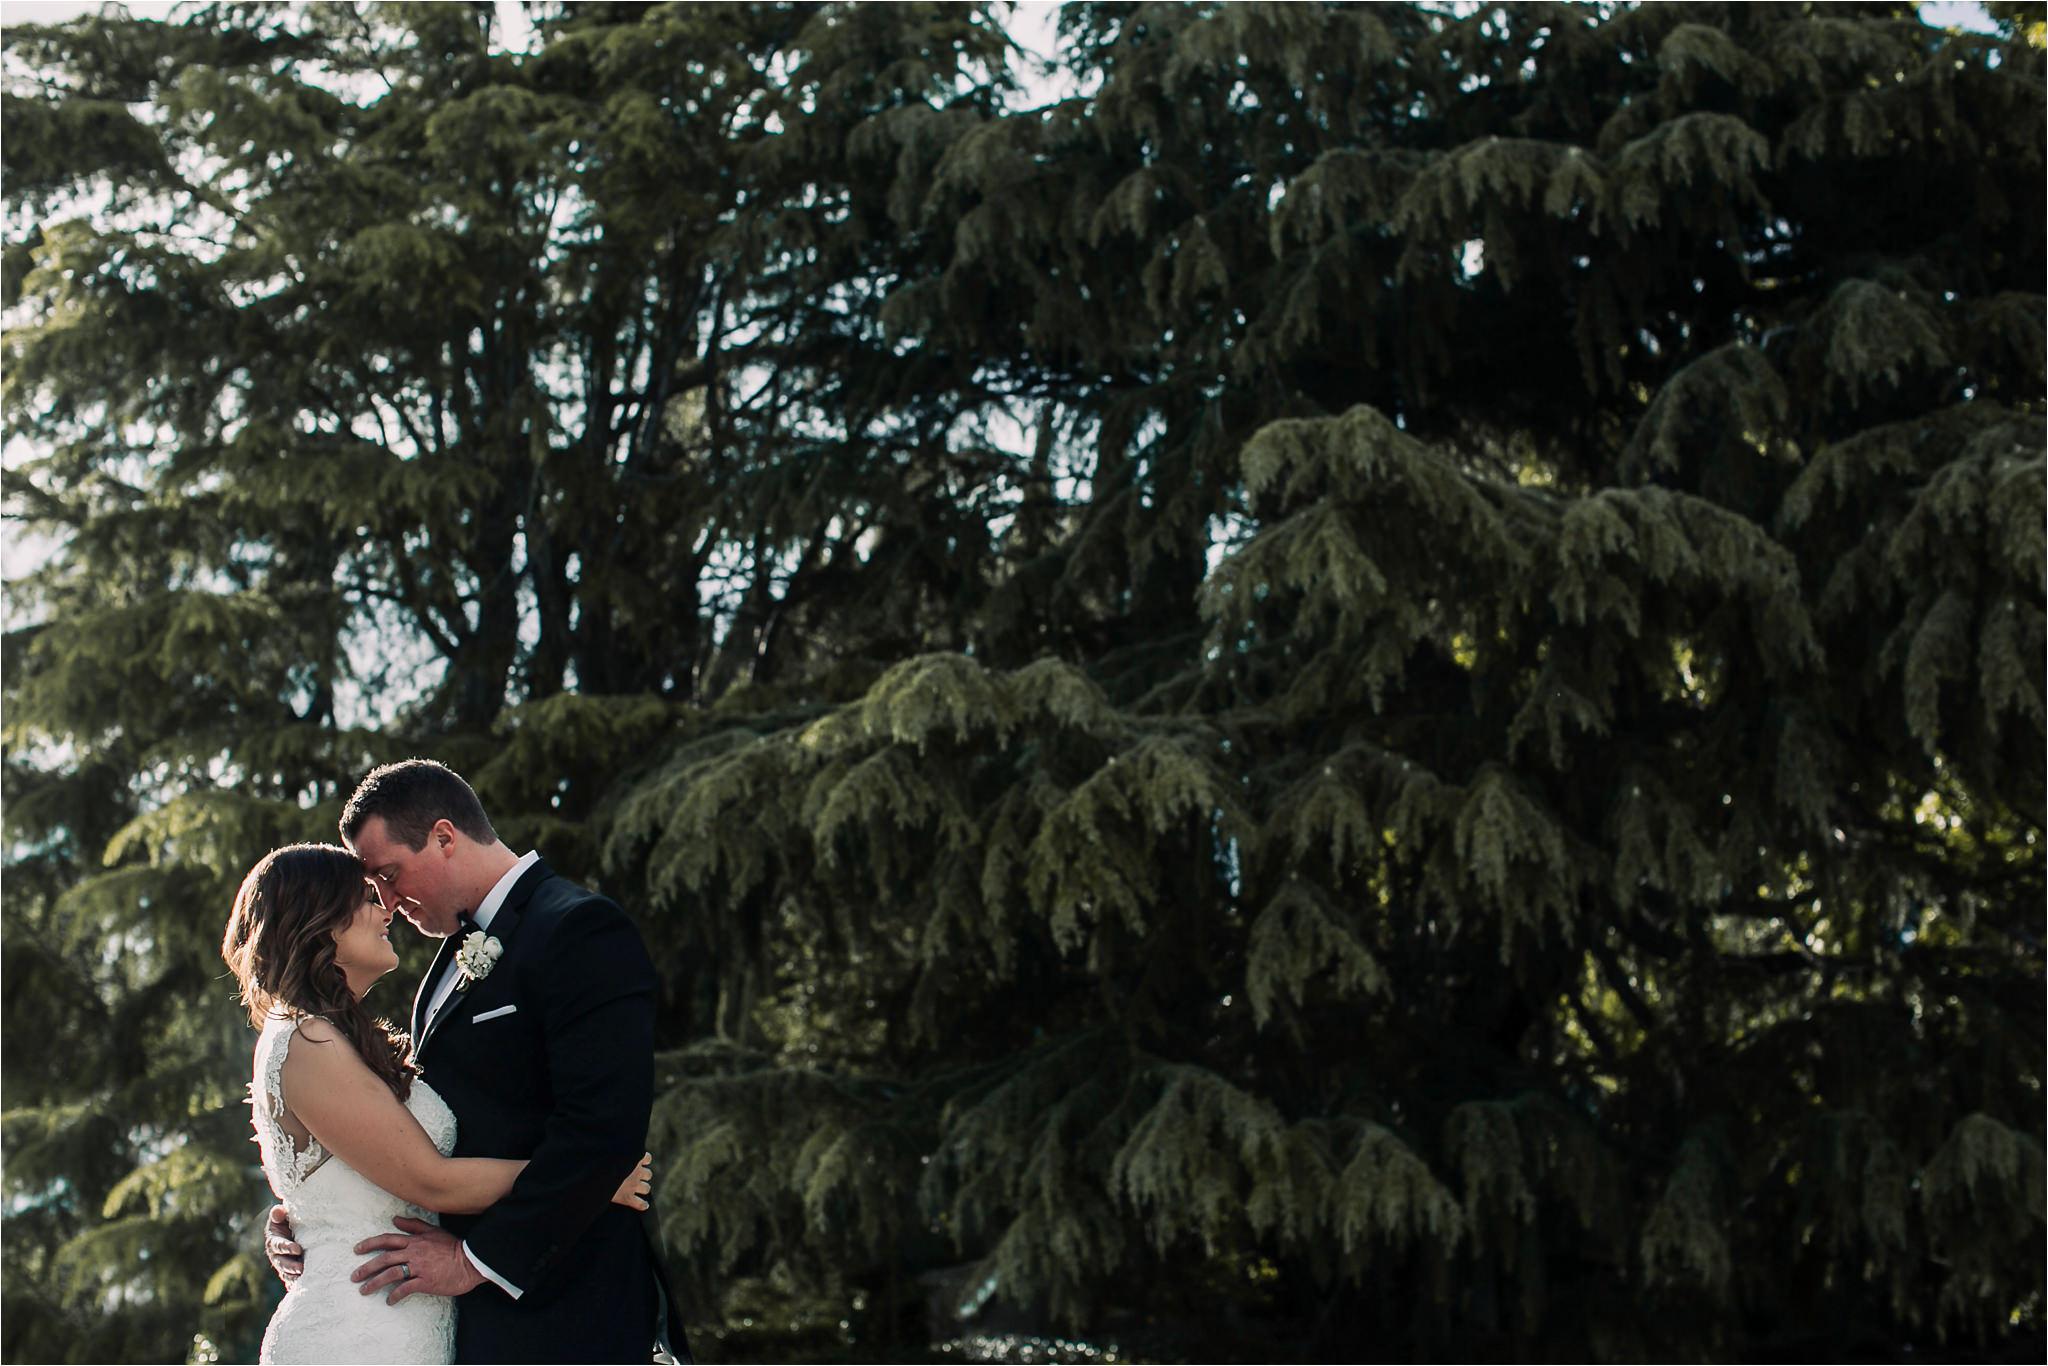 jessica-roman-photography-arden hills wedding photograpger-sacramento-boise-32.jpg